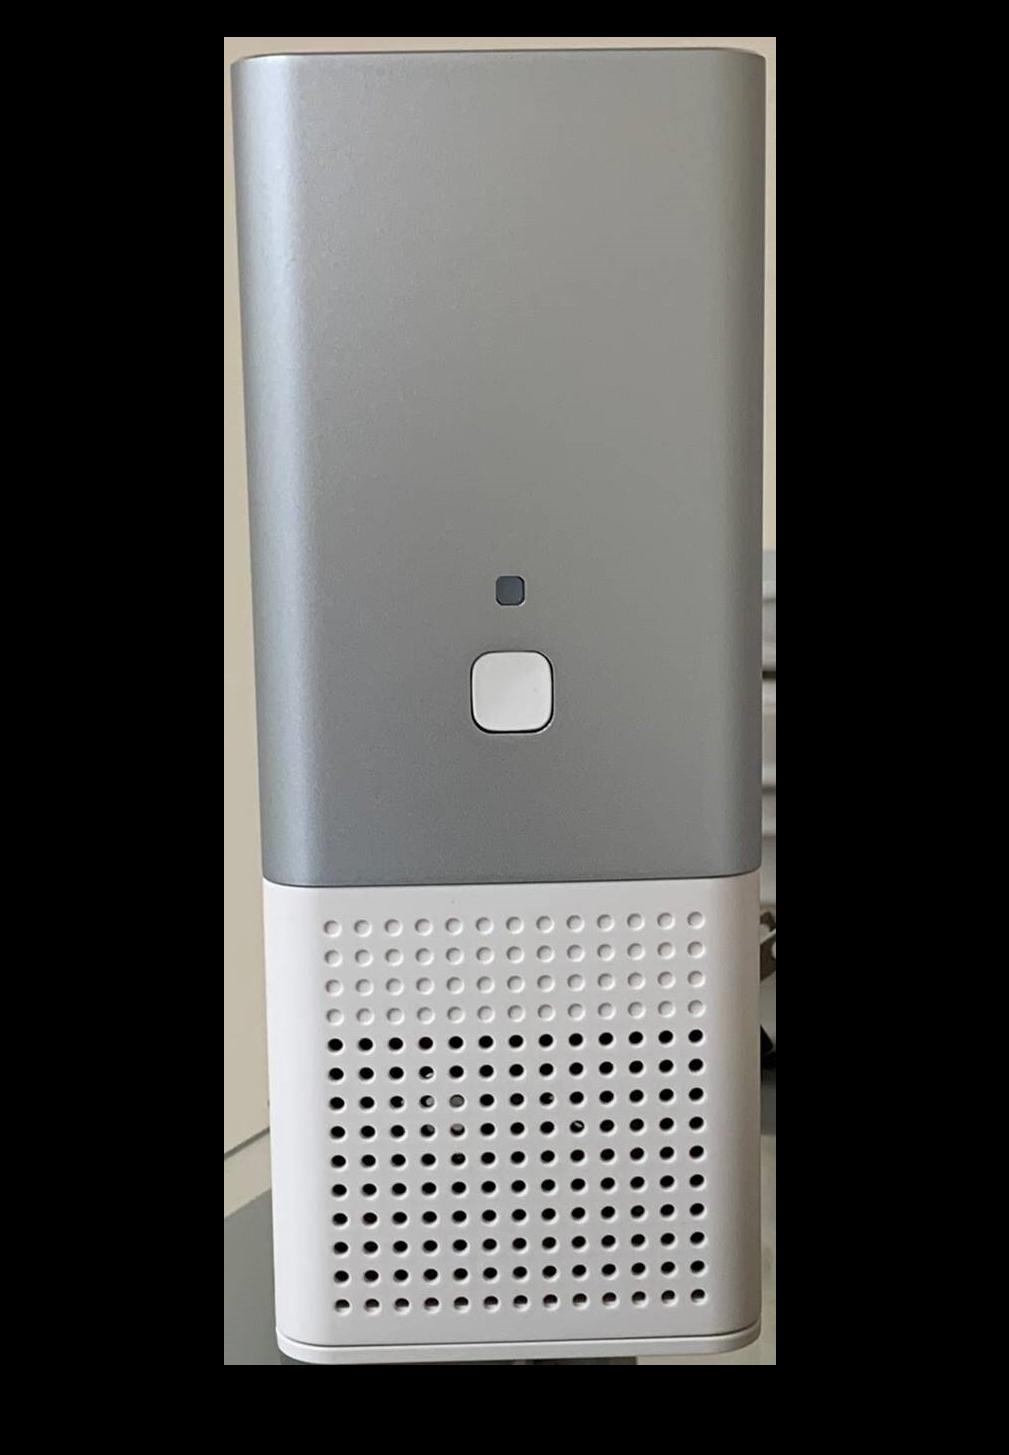 Reme Halo Ion air purifier